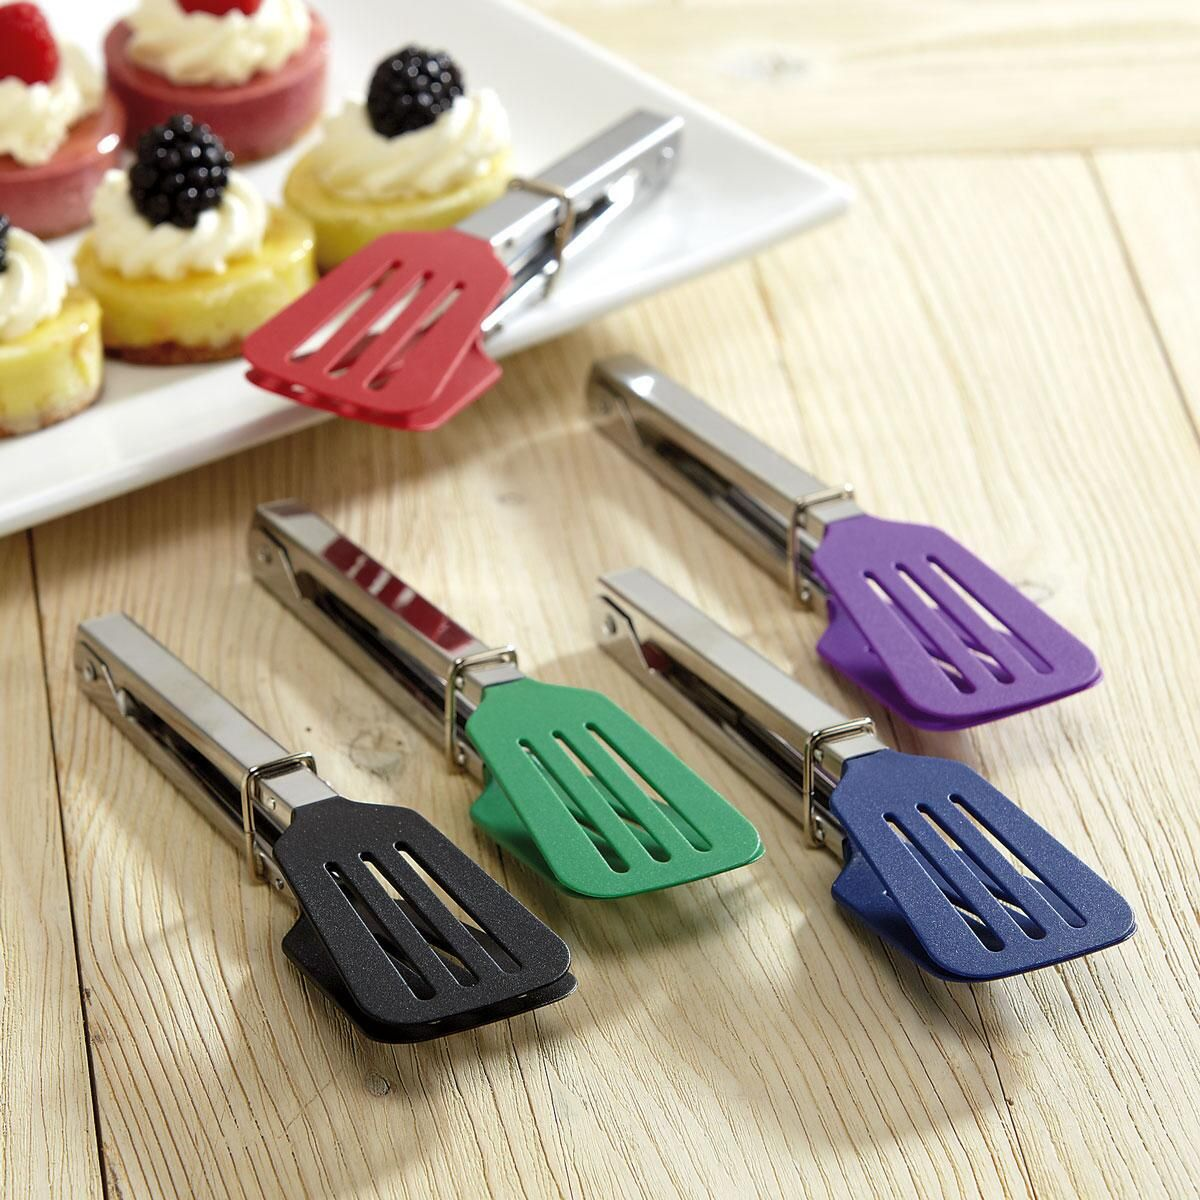 Colorful Kitchen Mini Spatula Tongs